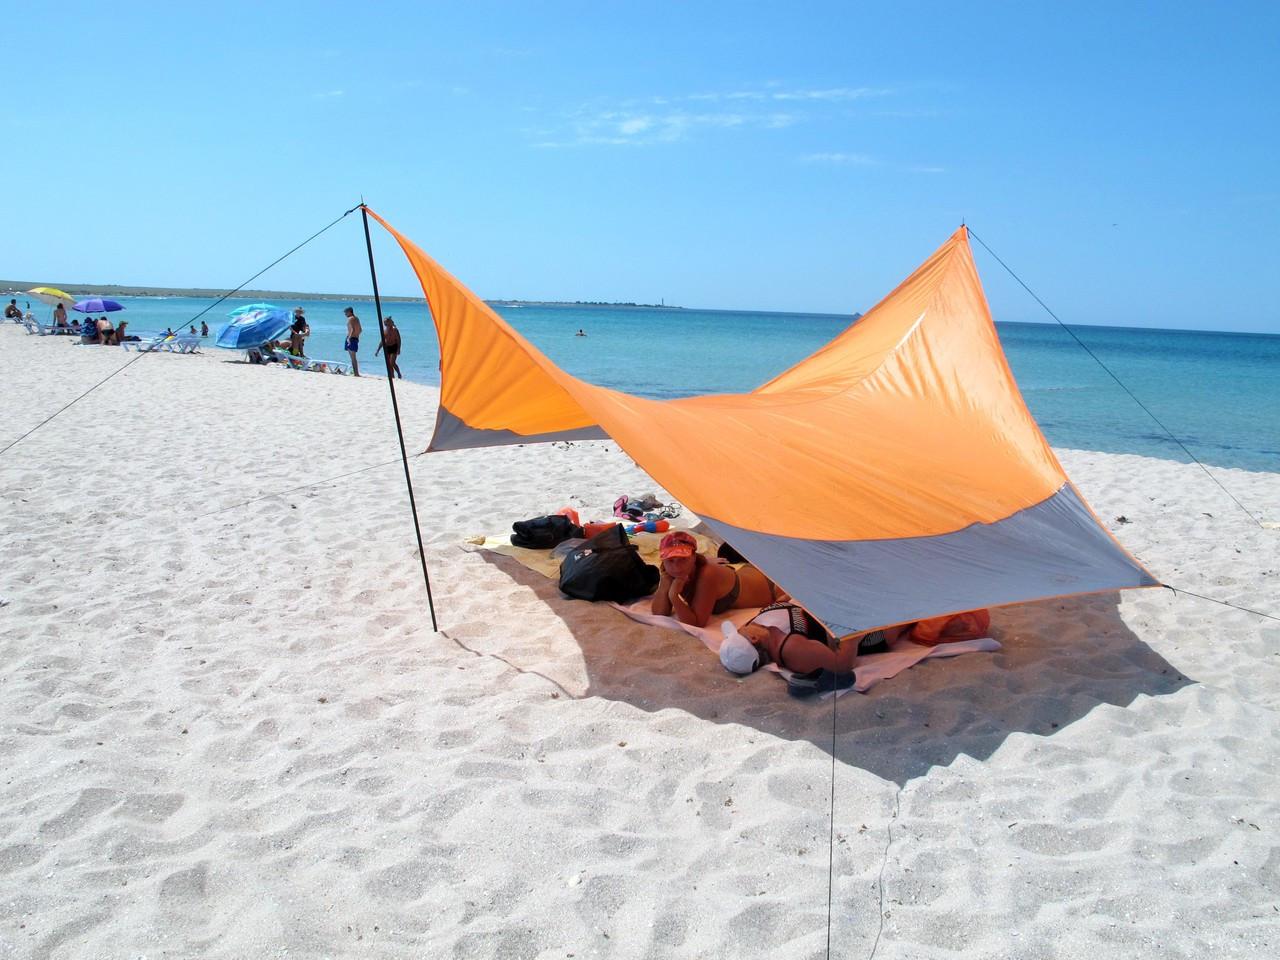 Тент Tramp Lite 440 x 440 см оранжевый TLT-011. Тент туристический. тент кемпинговый